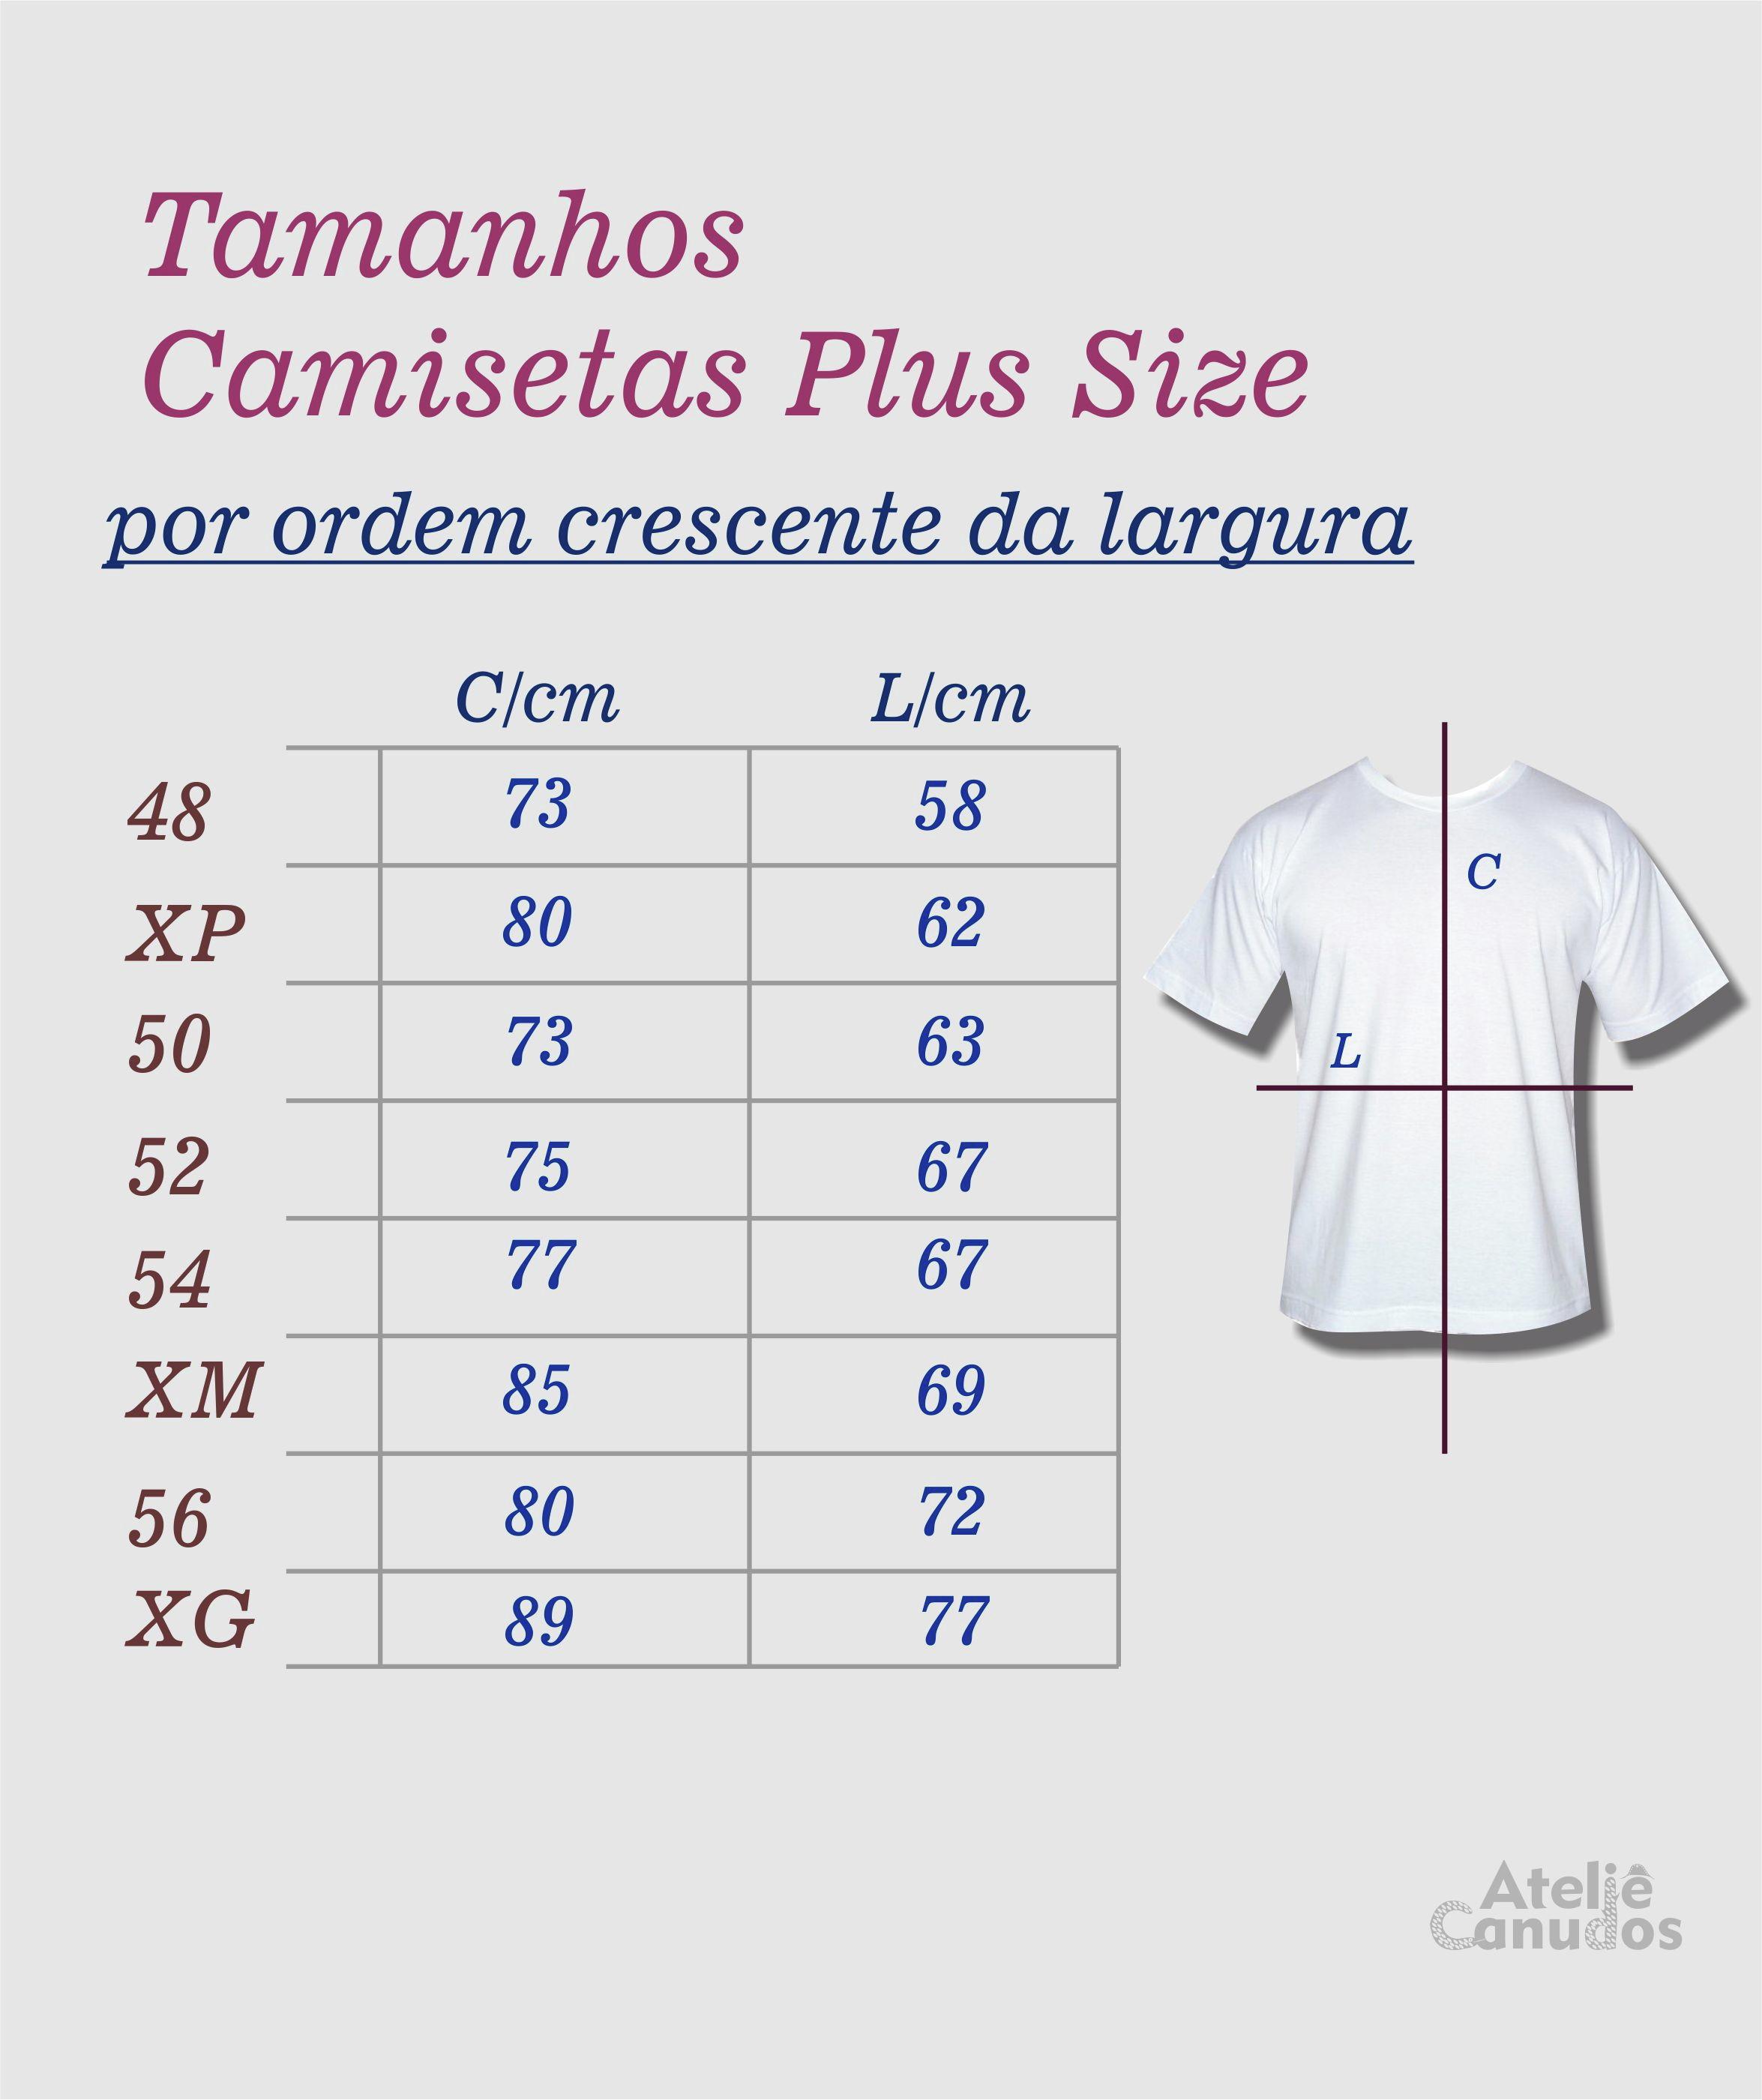 2da28615ca Camisa Atlético Mineiro Antifascista Plus Size no Elo7